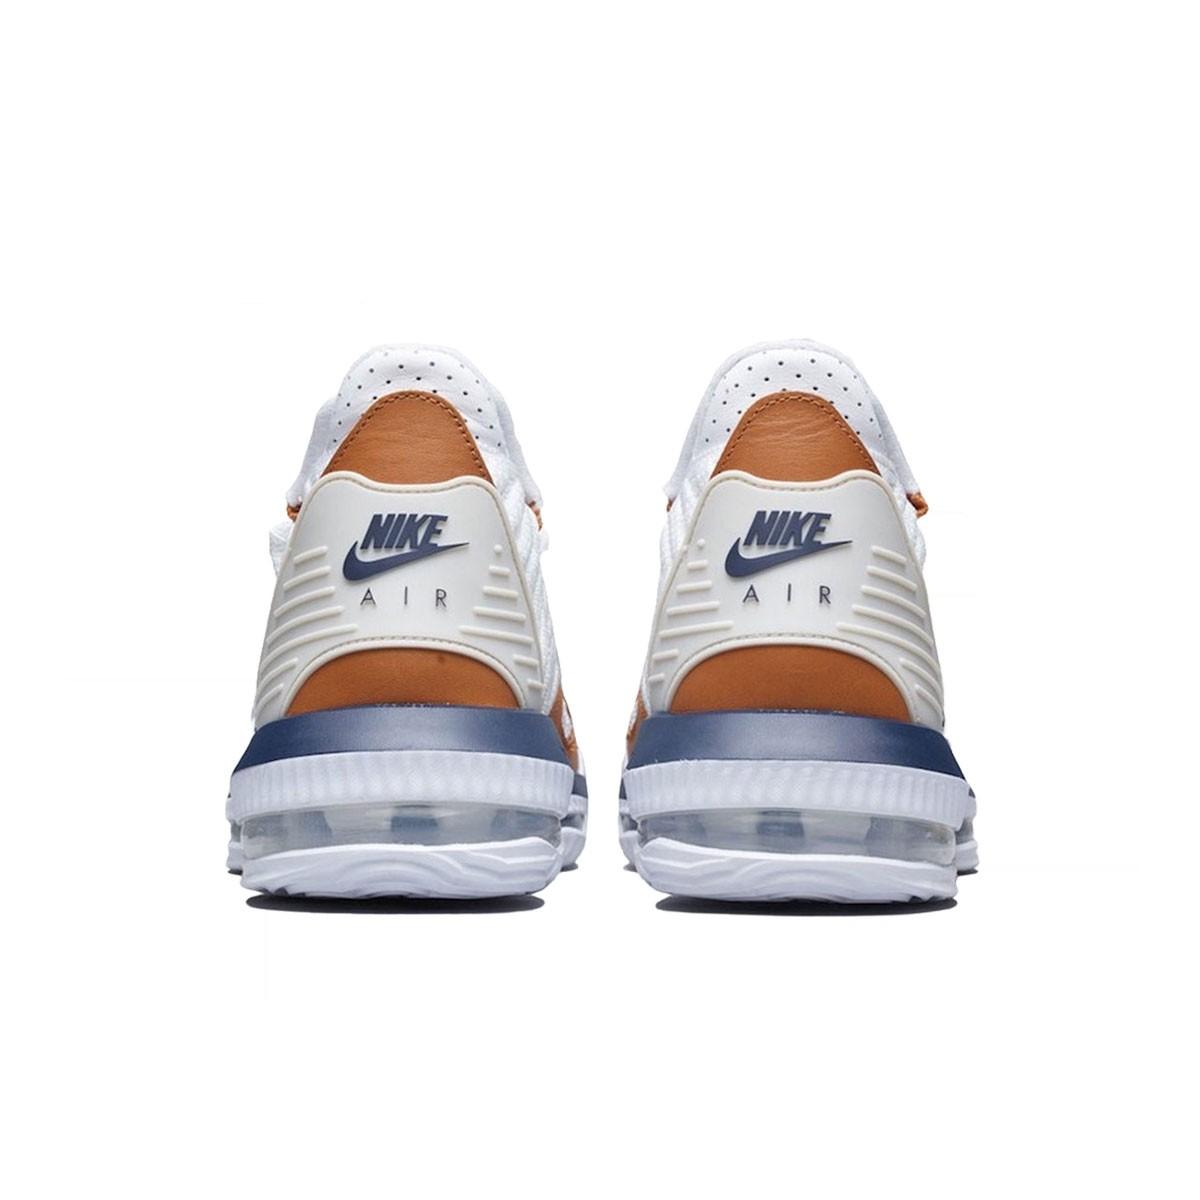 6e72cb47523 Buy Nike Lebron XVI  Air Trainer  Basketball shoes   sneakers